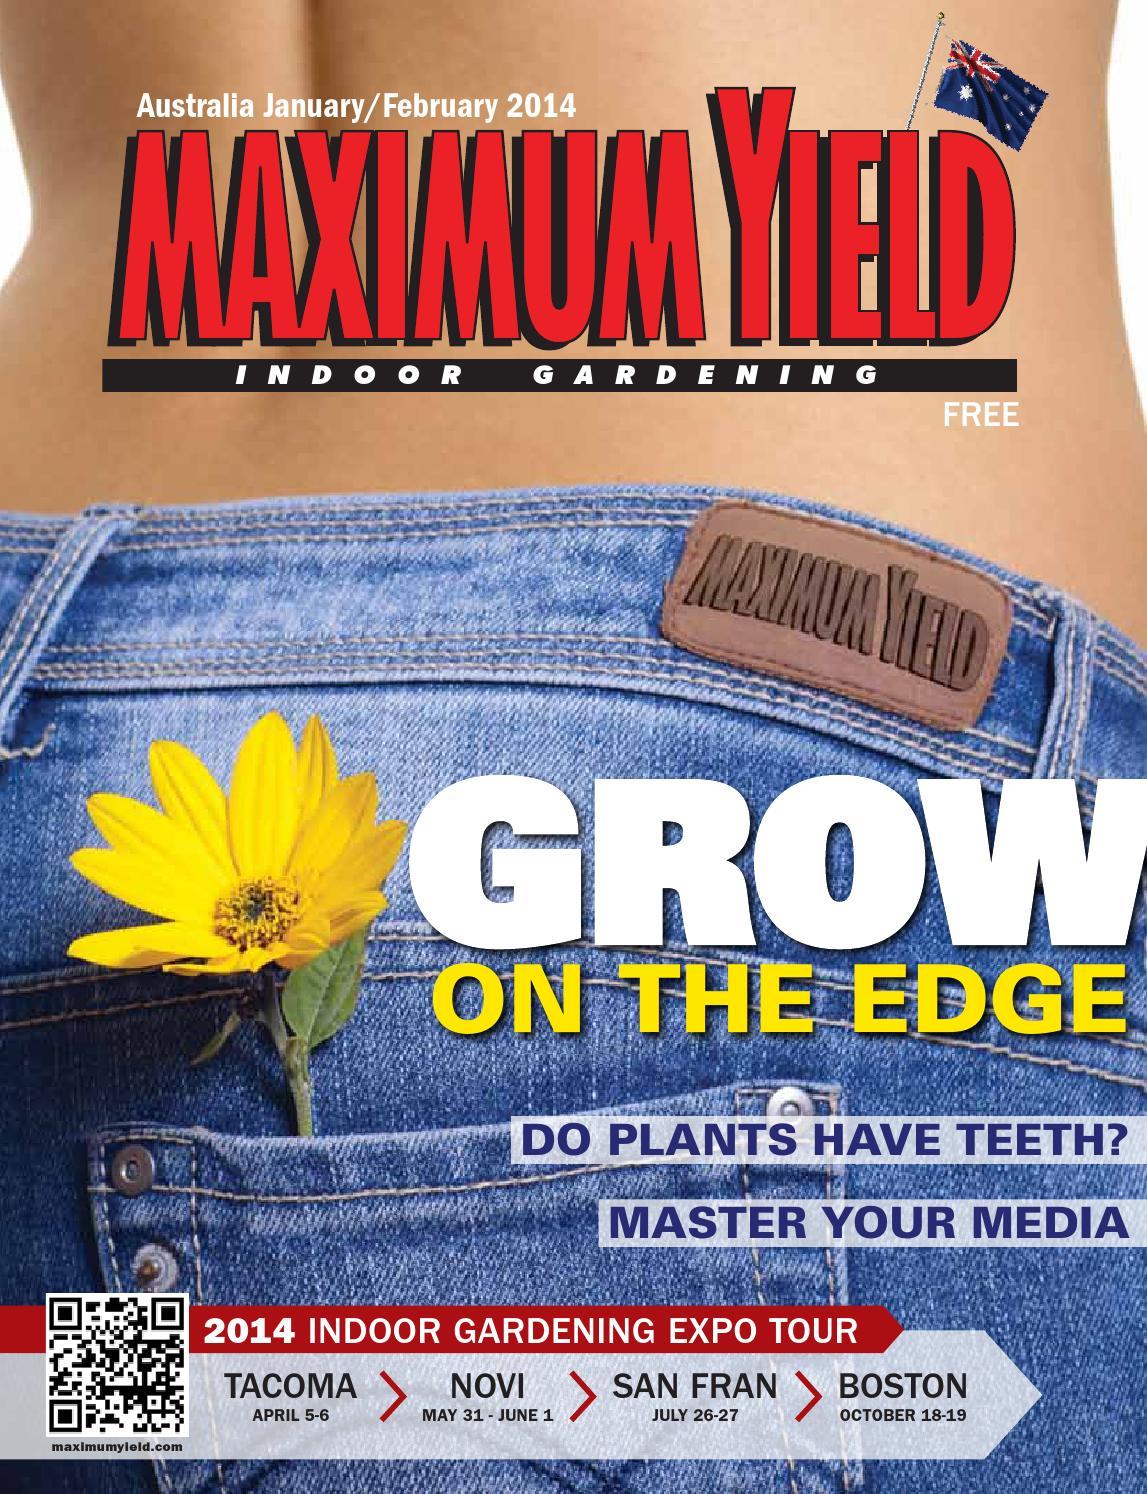 Maximum yield australia january february 2014 by maximum for Indoor gardening expo 2014